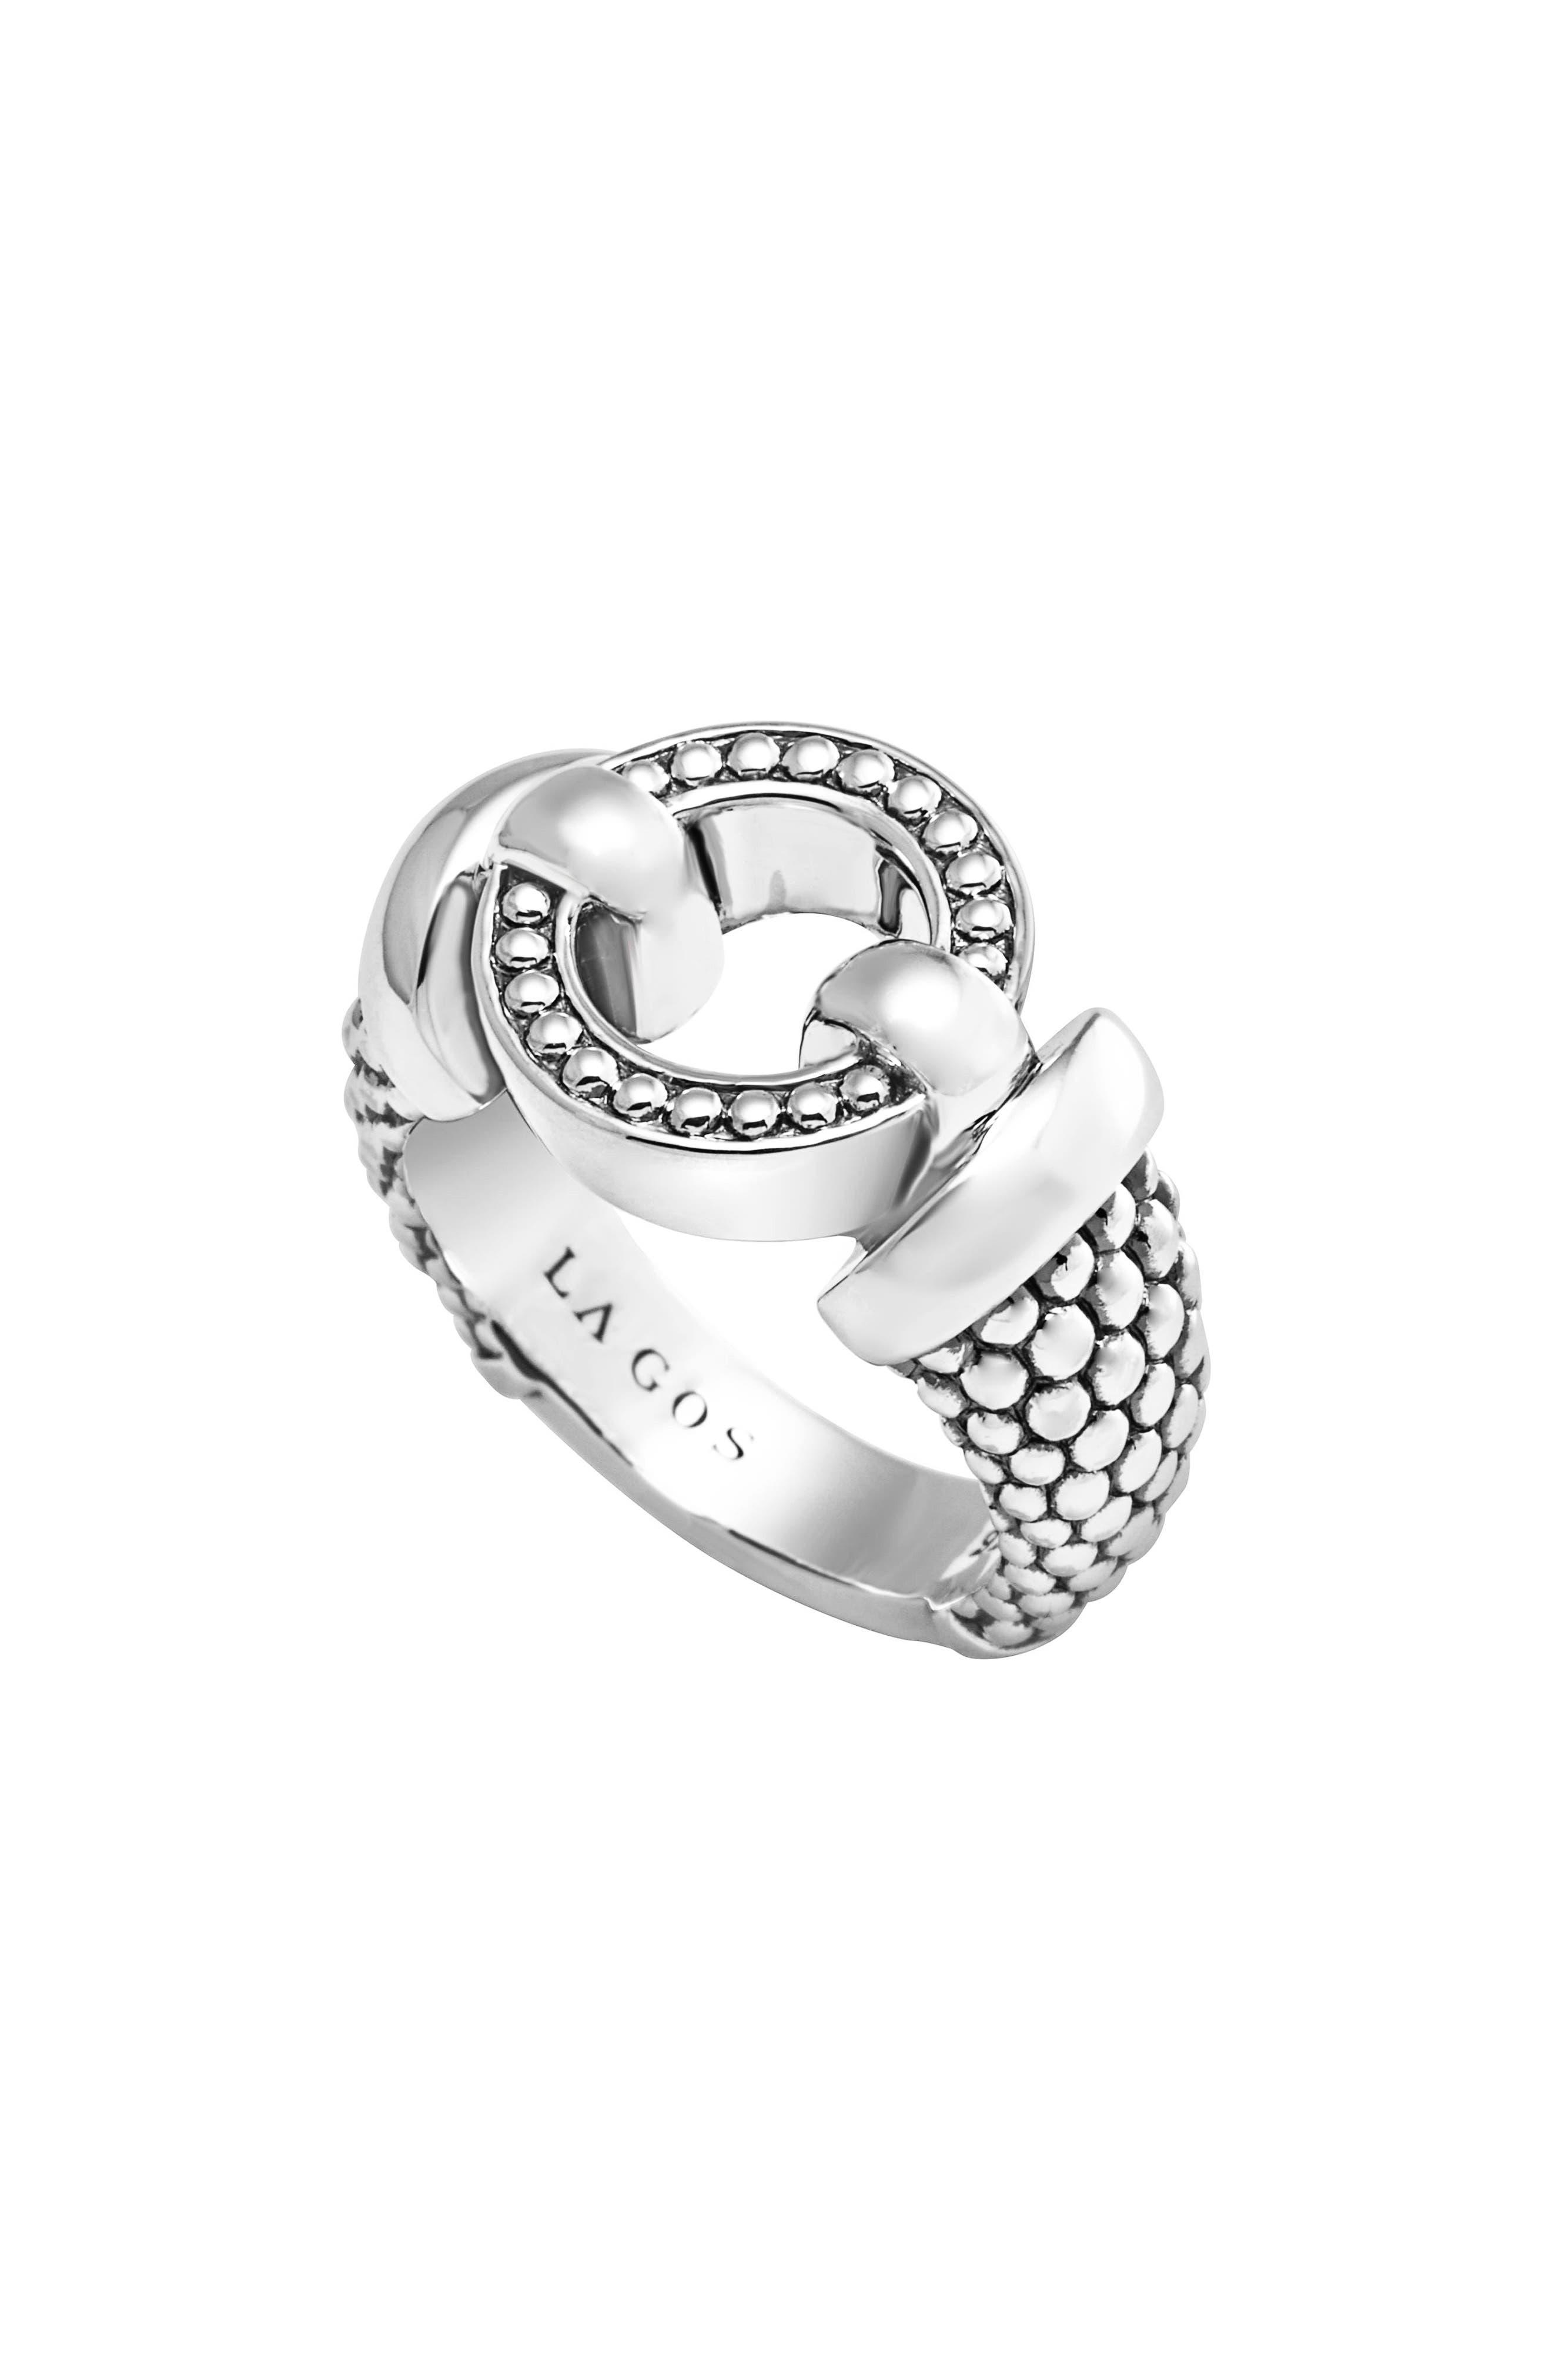 Lagos 'Enso' Caviar™ Ring